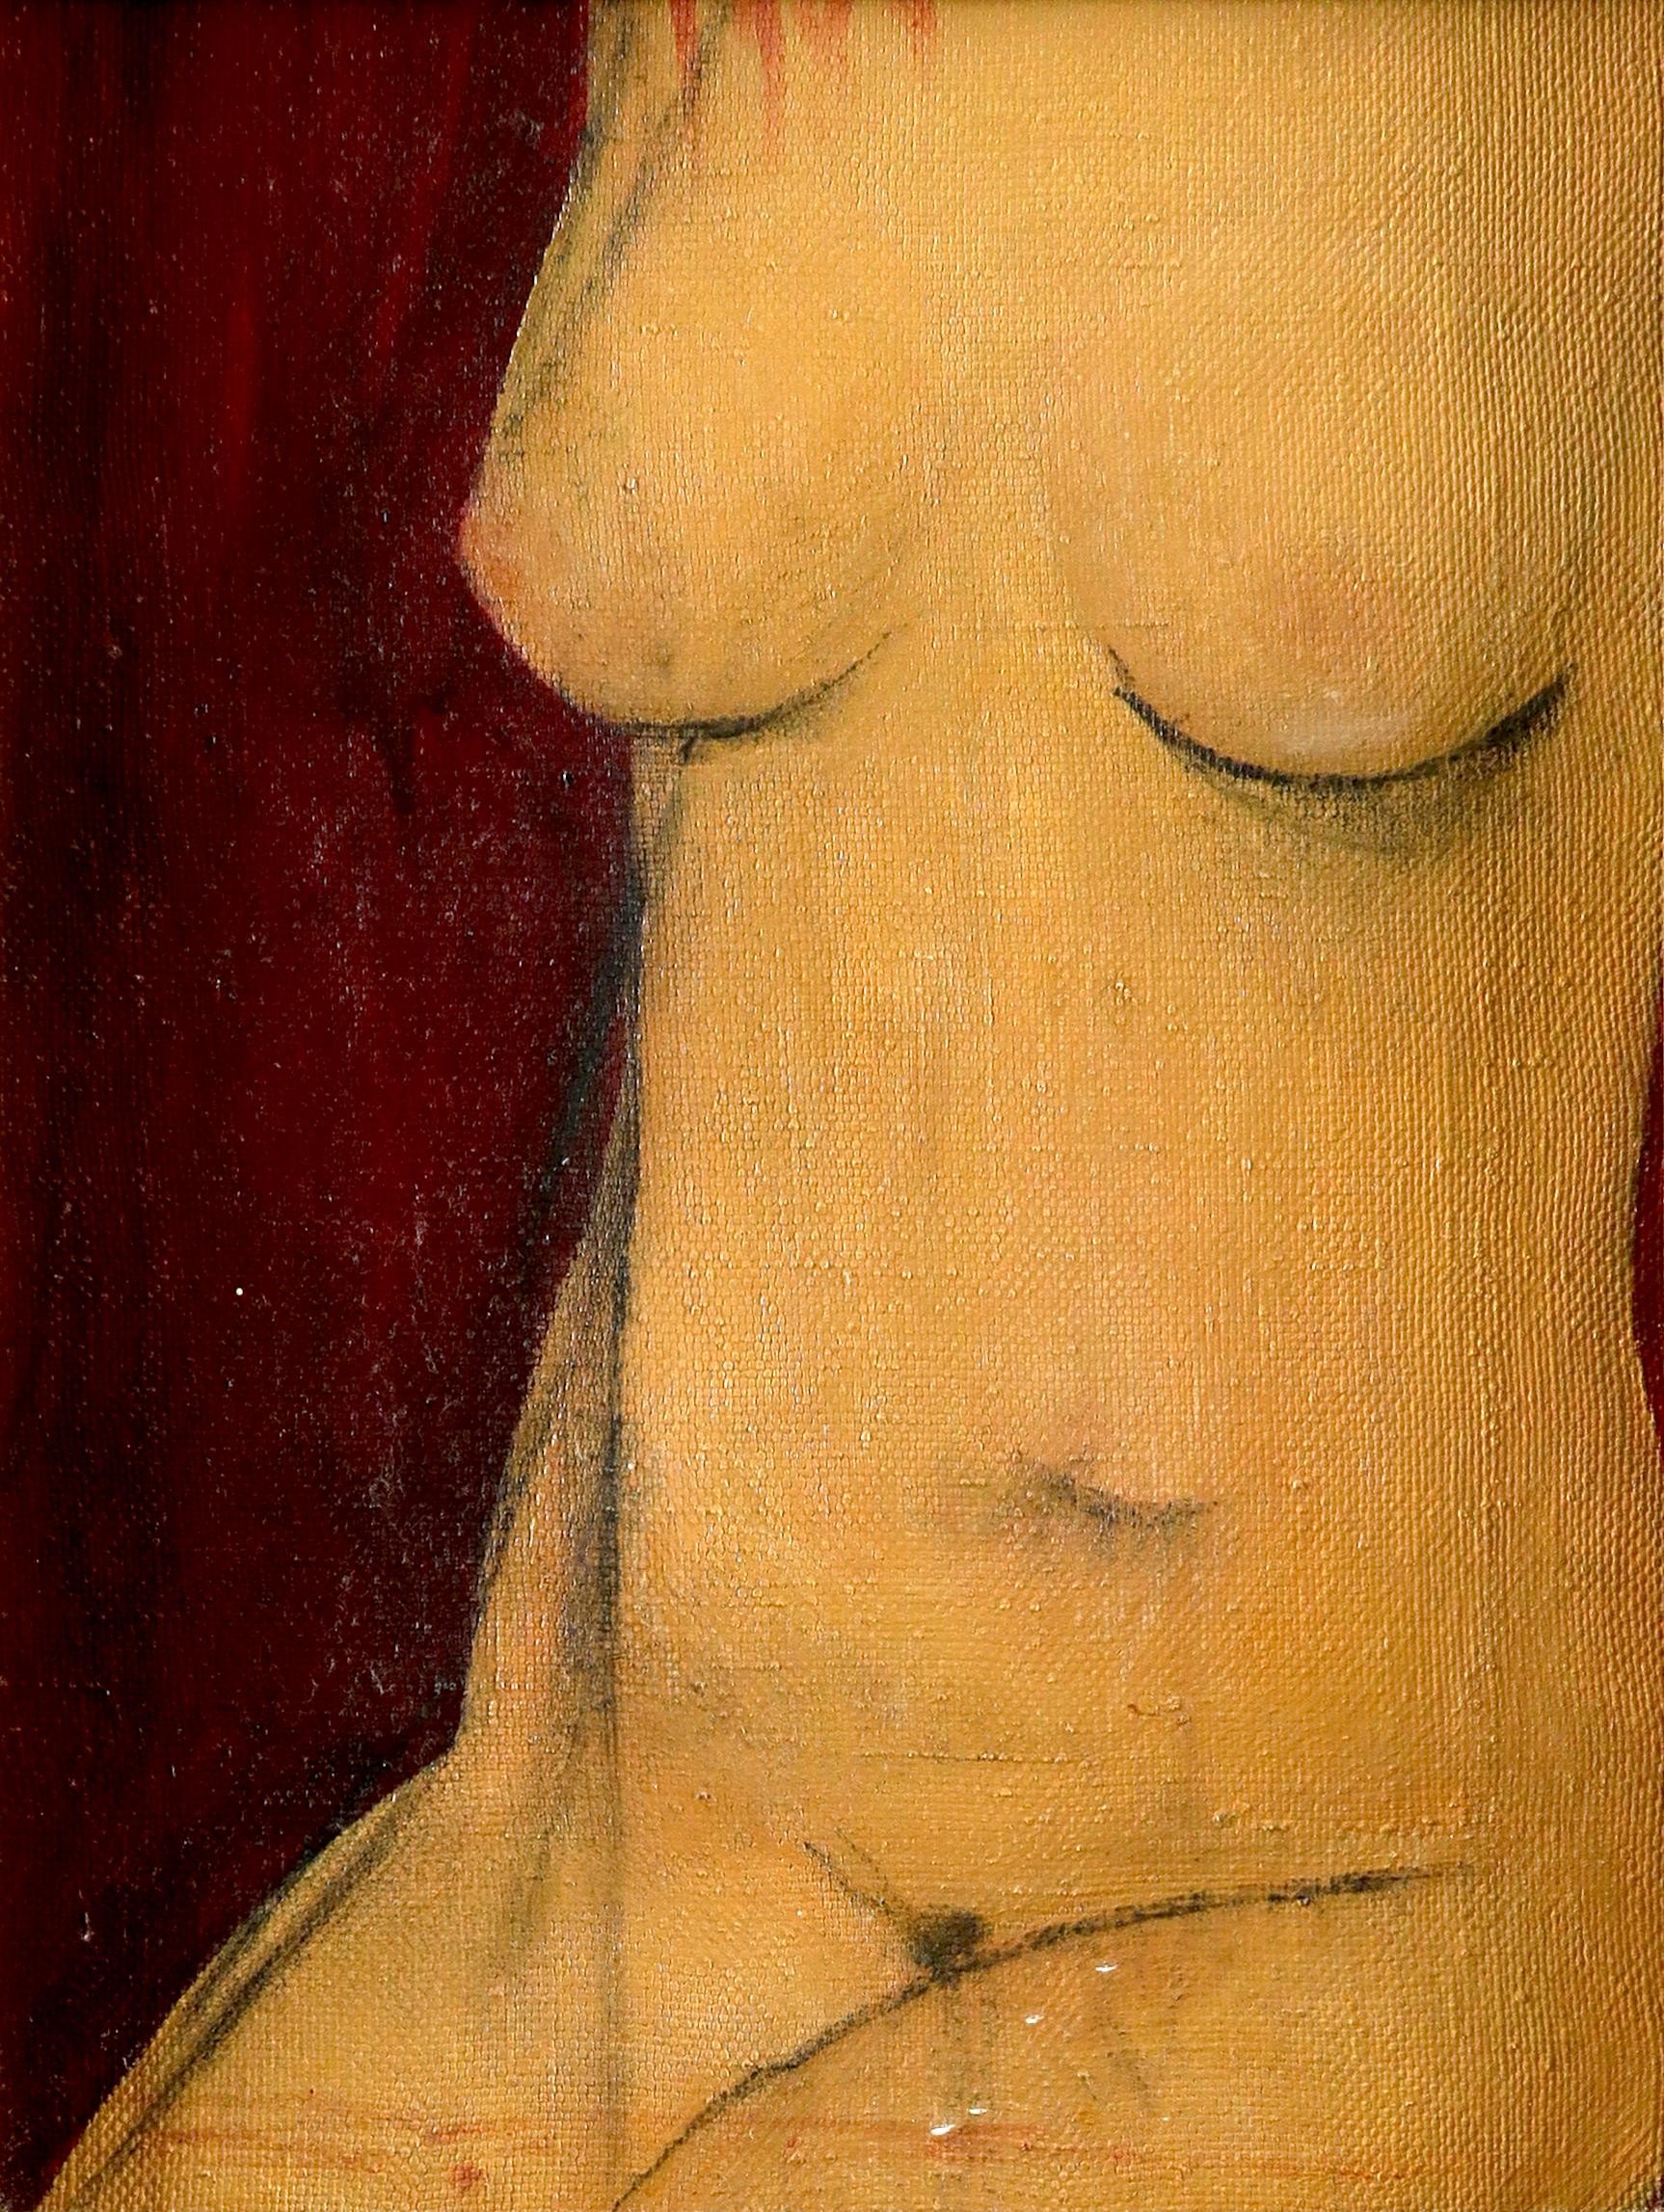 Valentin Khrushch (Ukrainian 1943-2005) Torso Oil on canvas 33.5 x 24.8cm Provenance: Hatchwell Fine